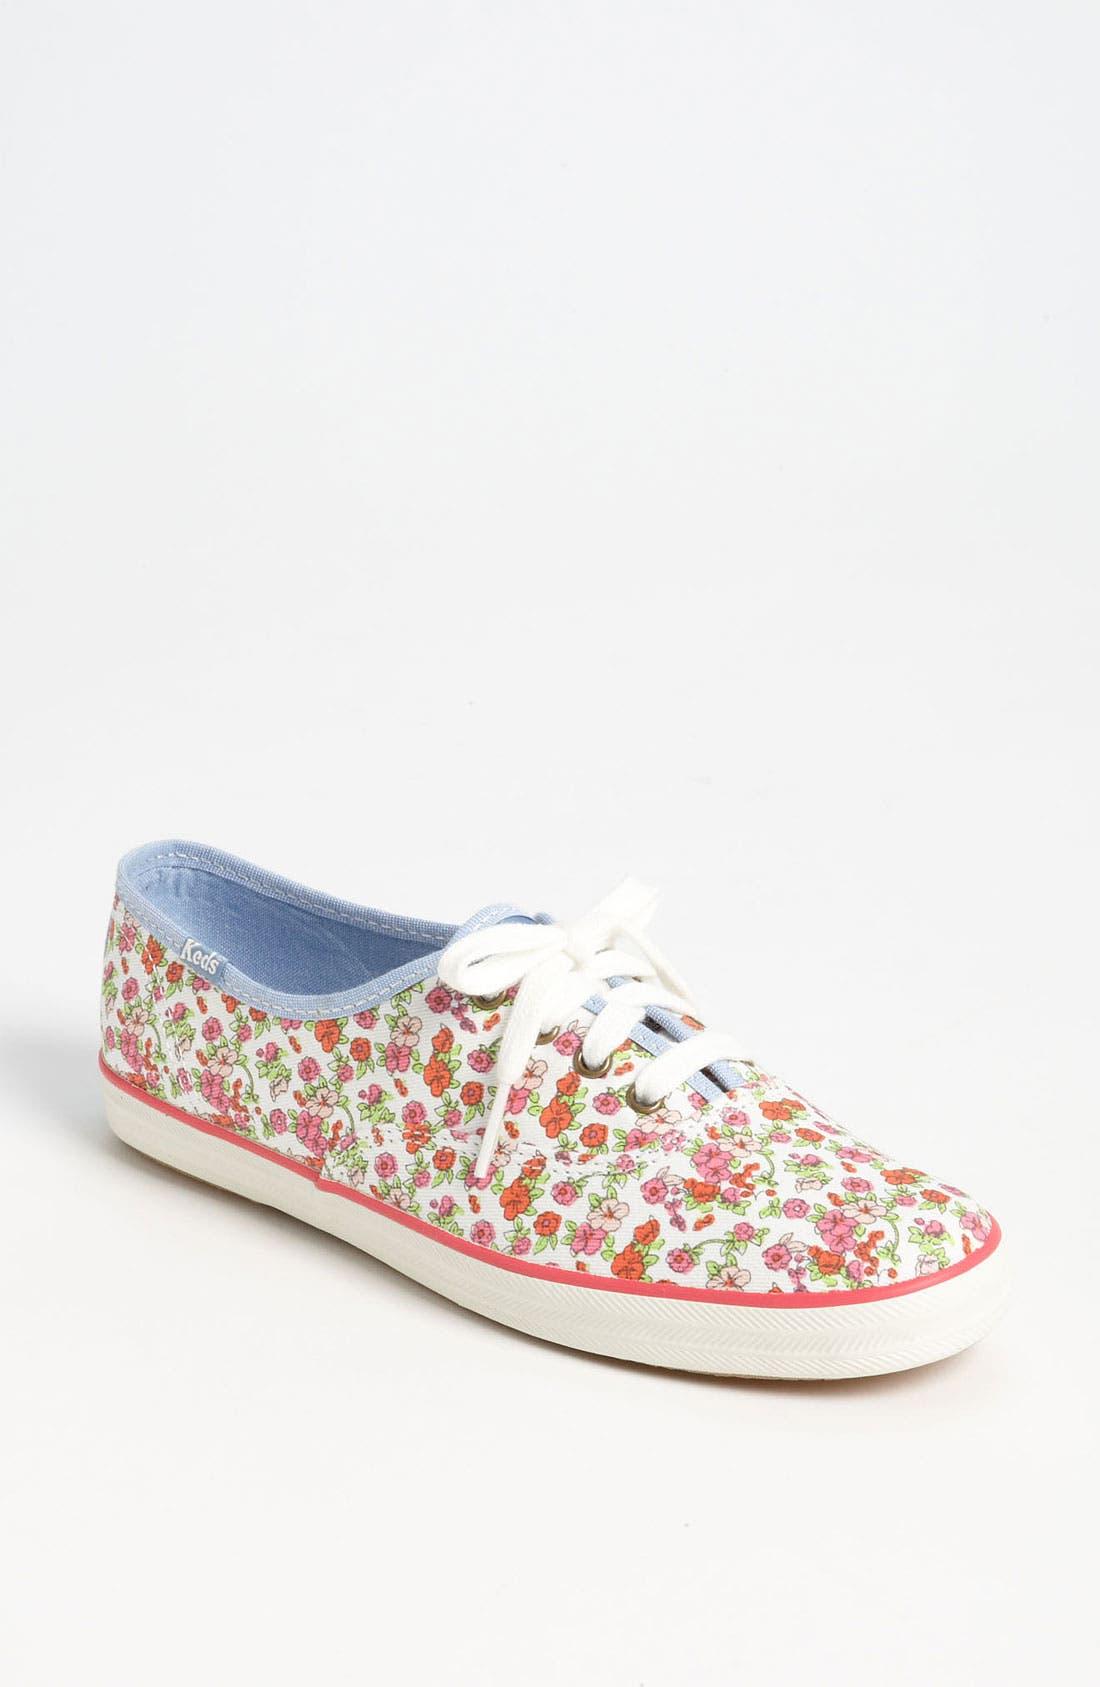 Main Image - Keds® 'Champion - Floral' Sneaker (Women)